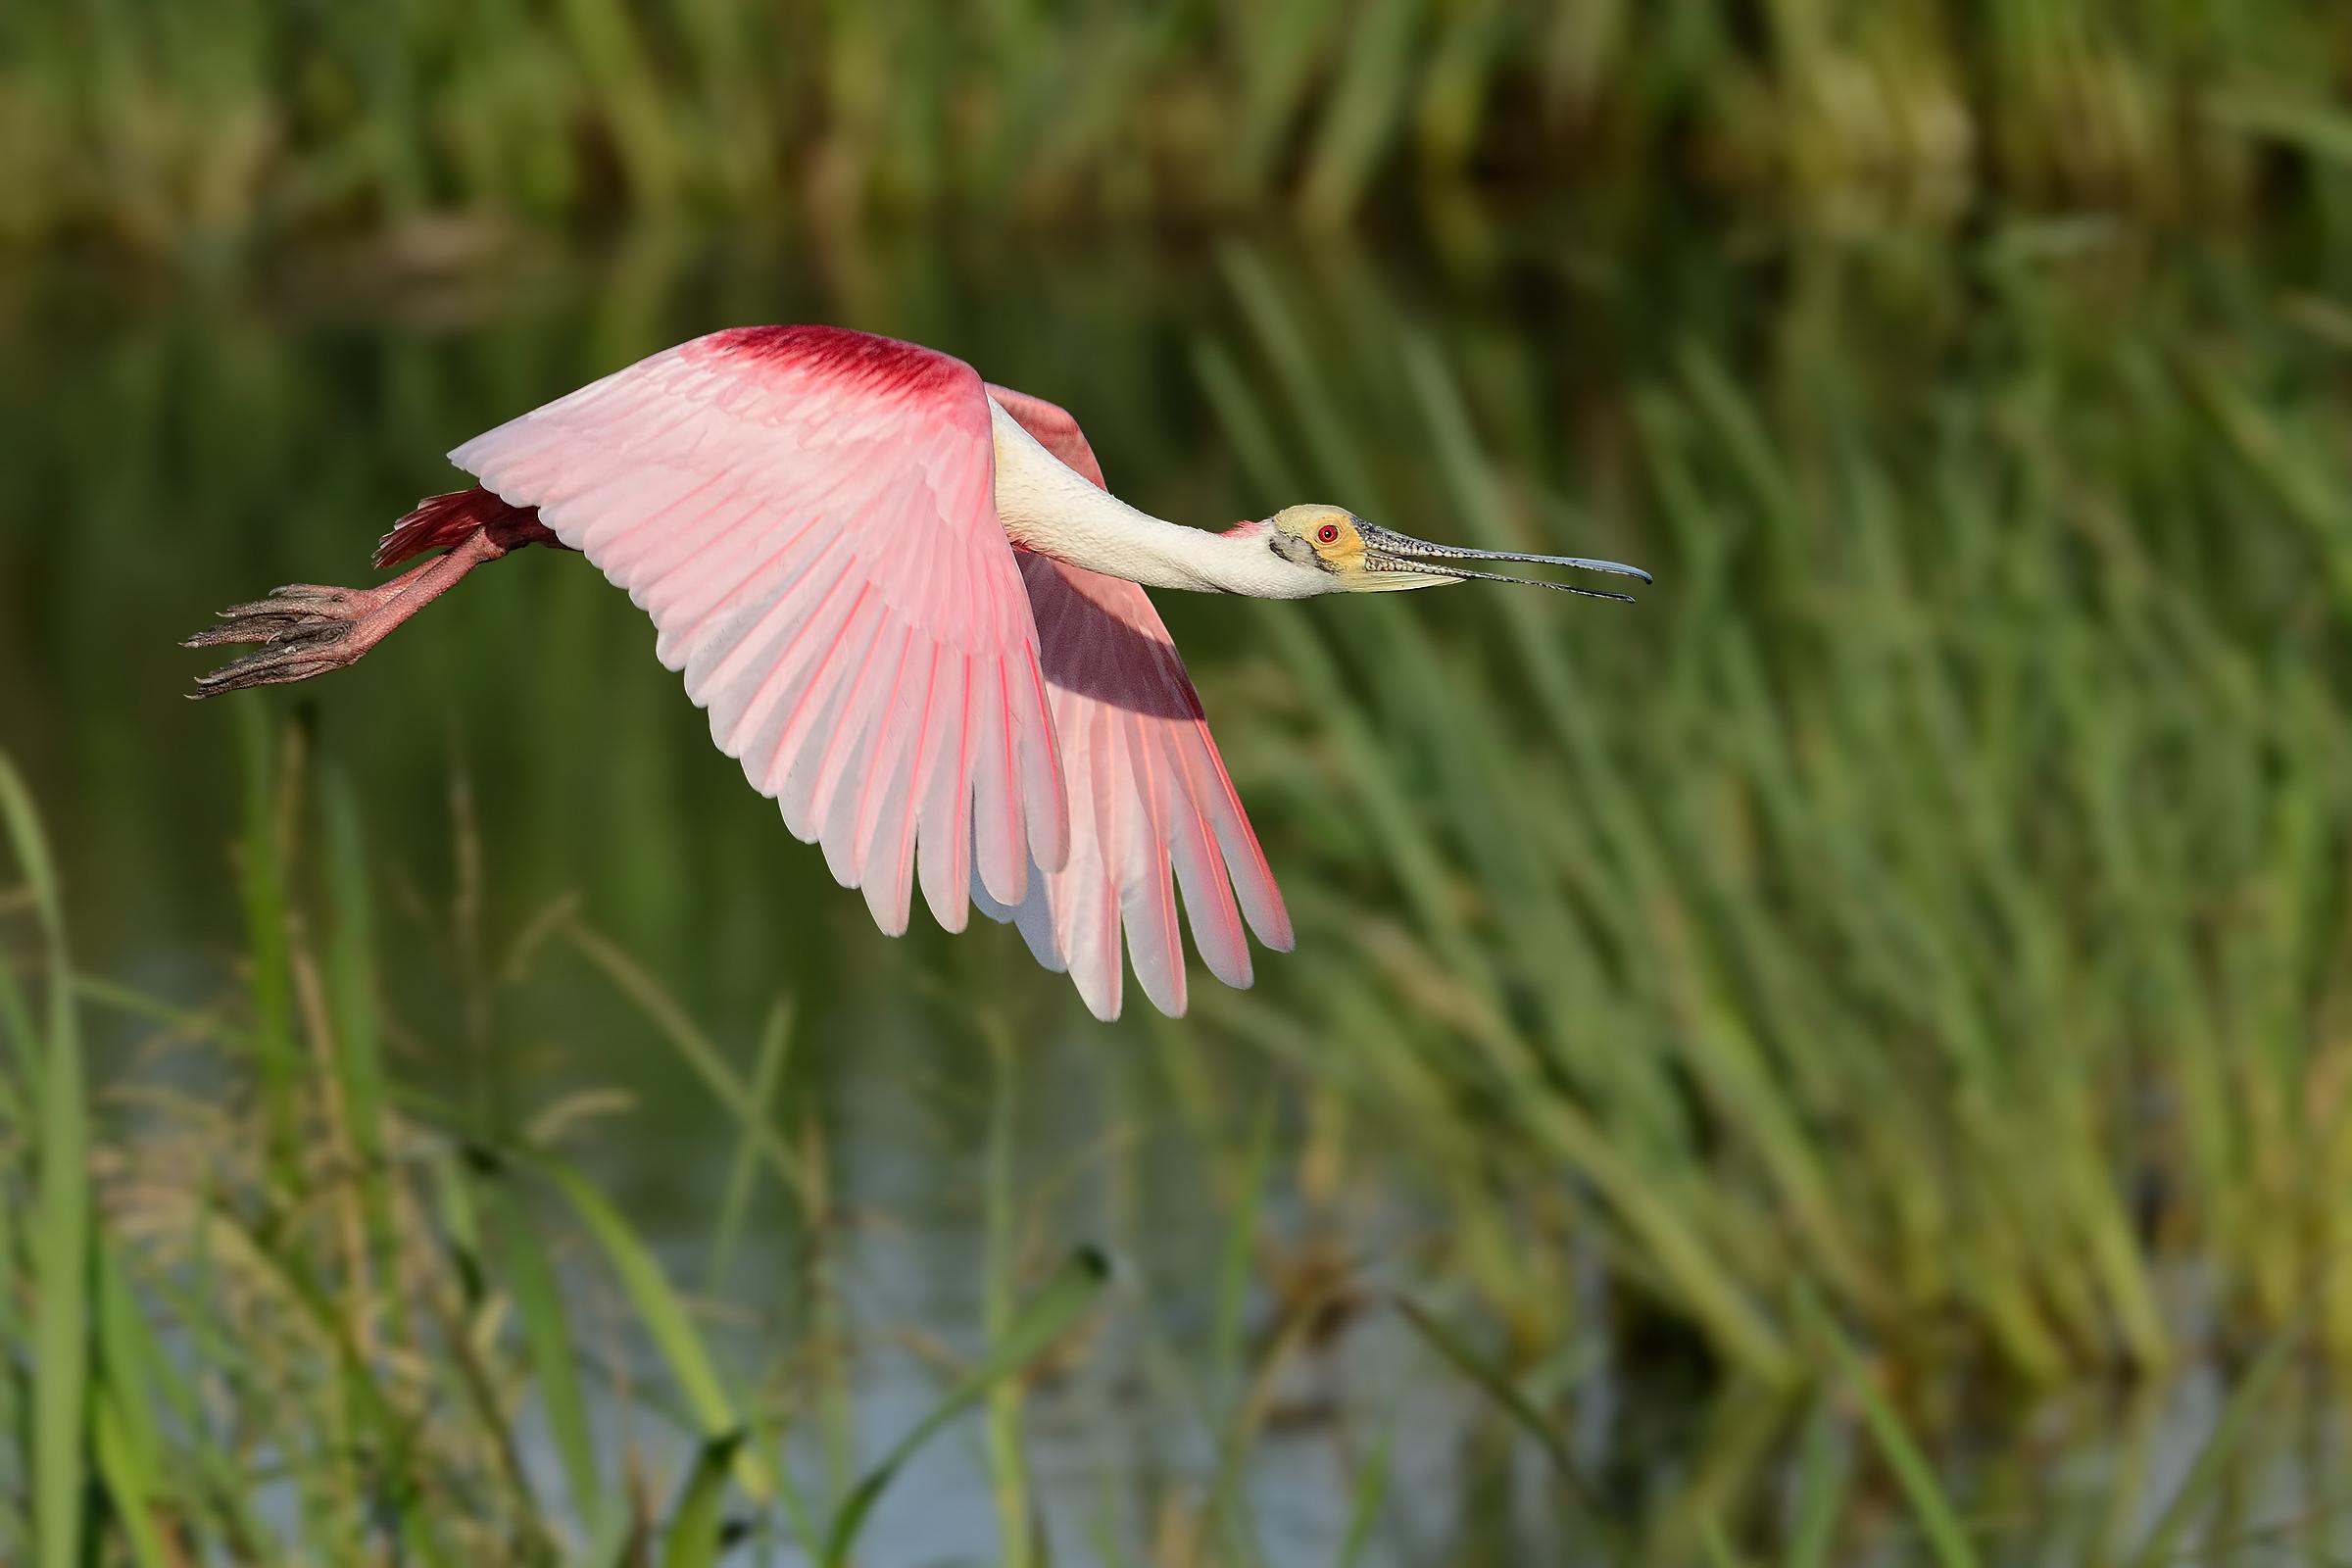 Roseate Spoonbill. Photo: Bill Dix/Audubon Photography Awards.